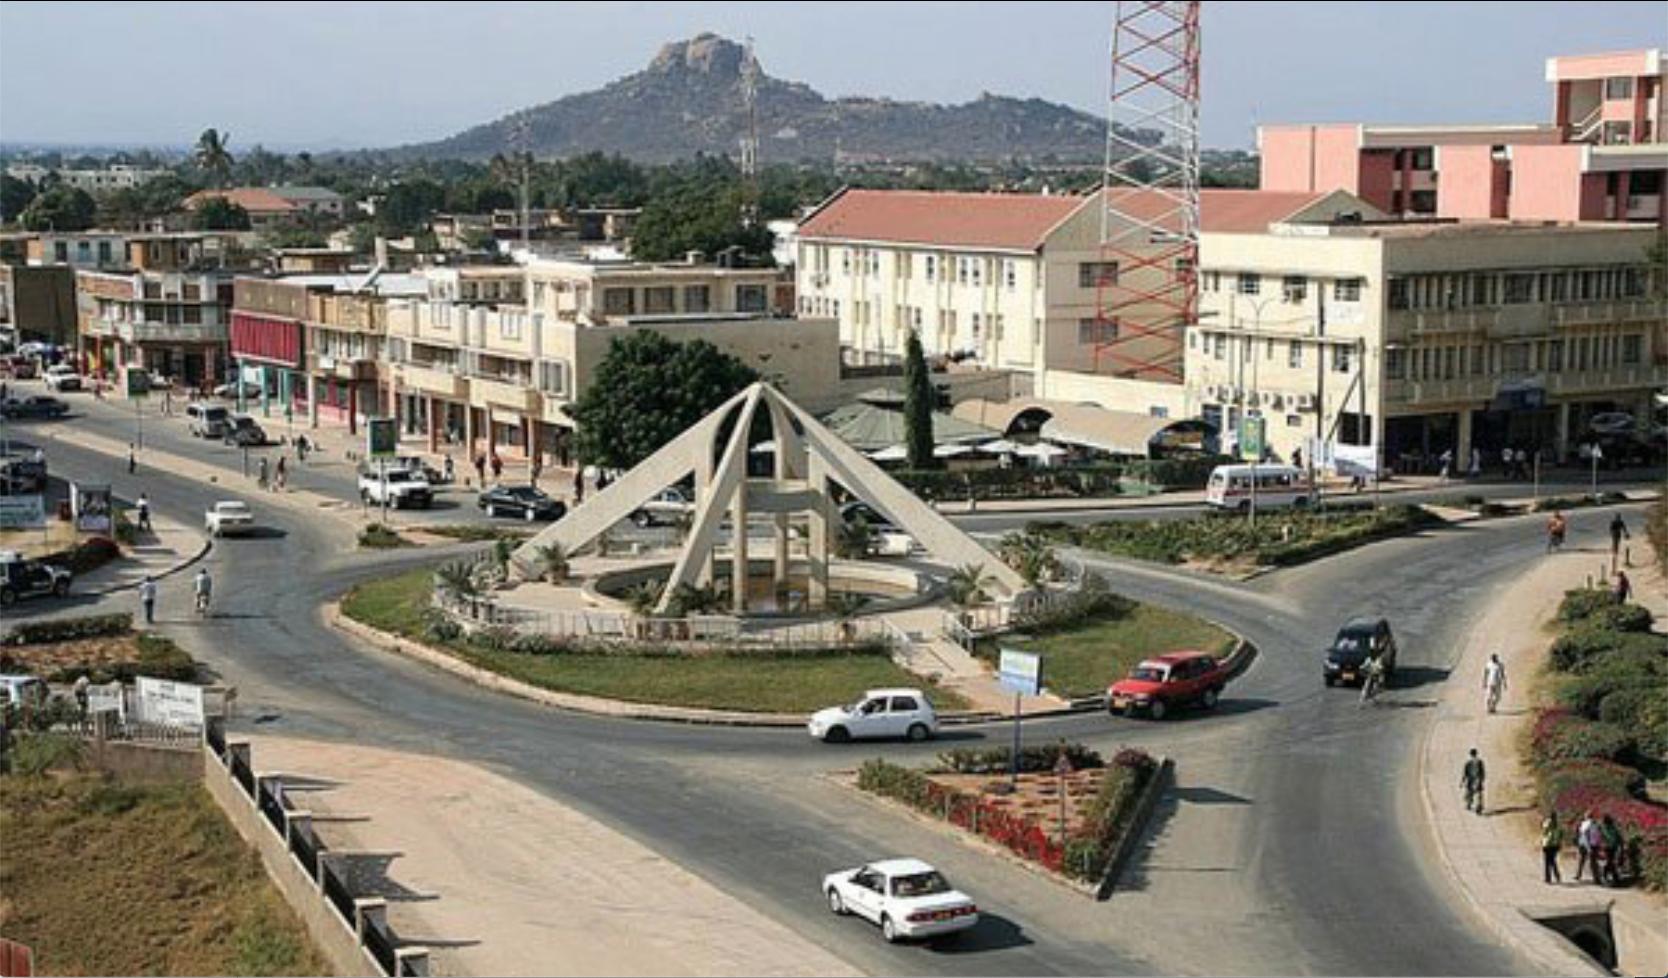 Dar es Salaam Image Archive1